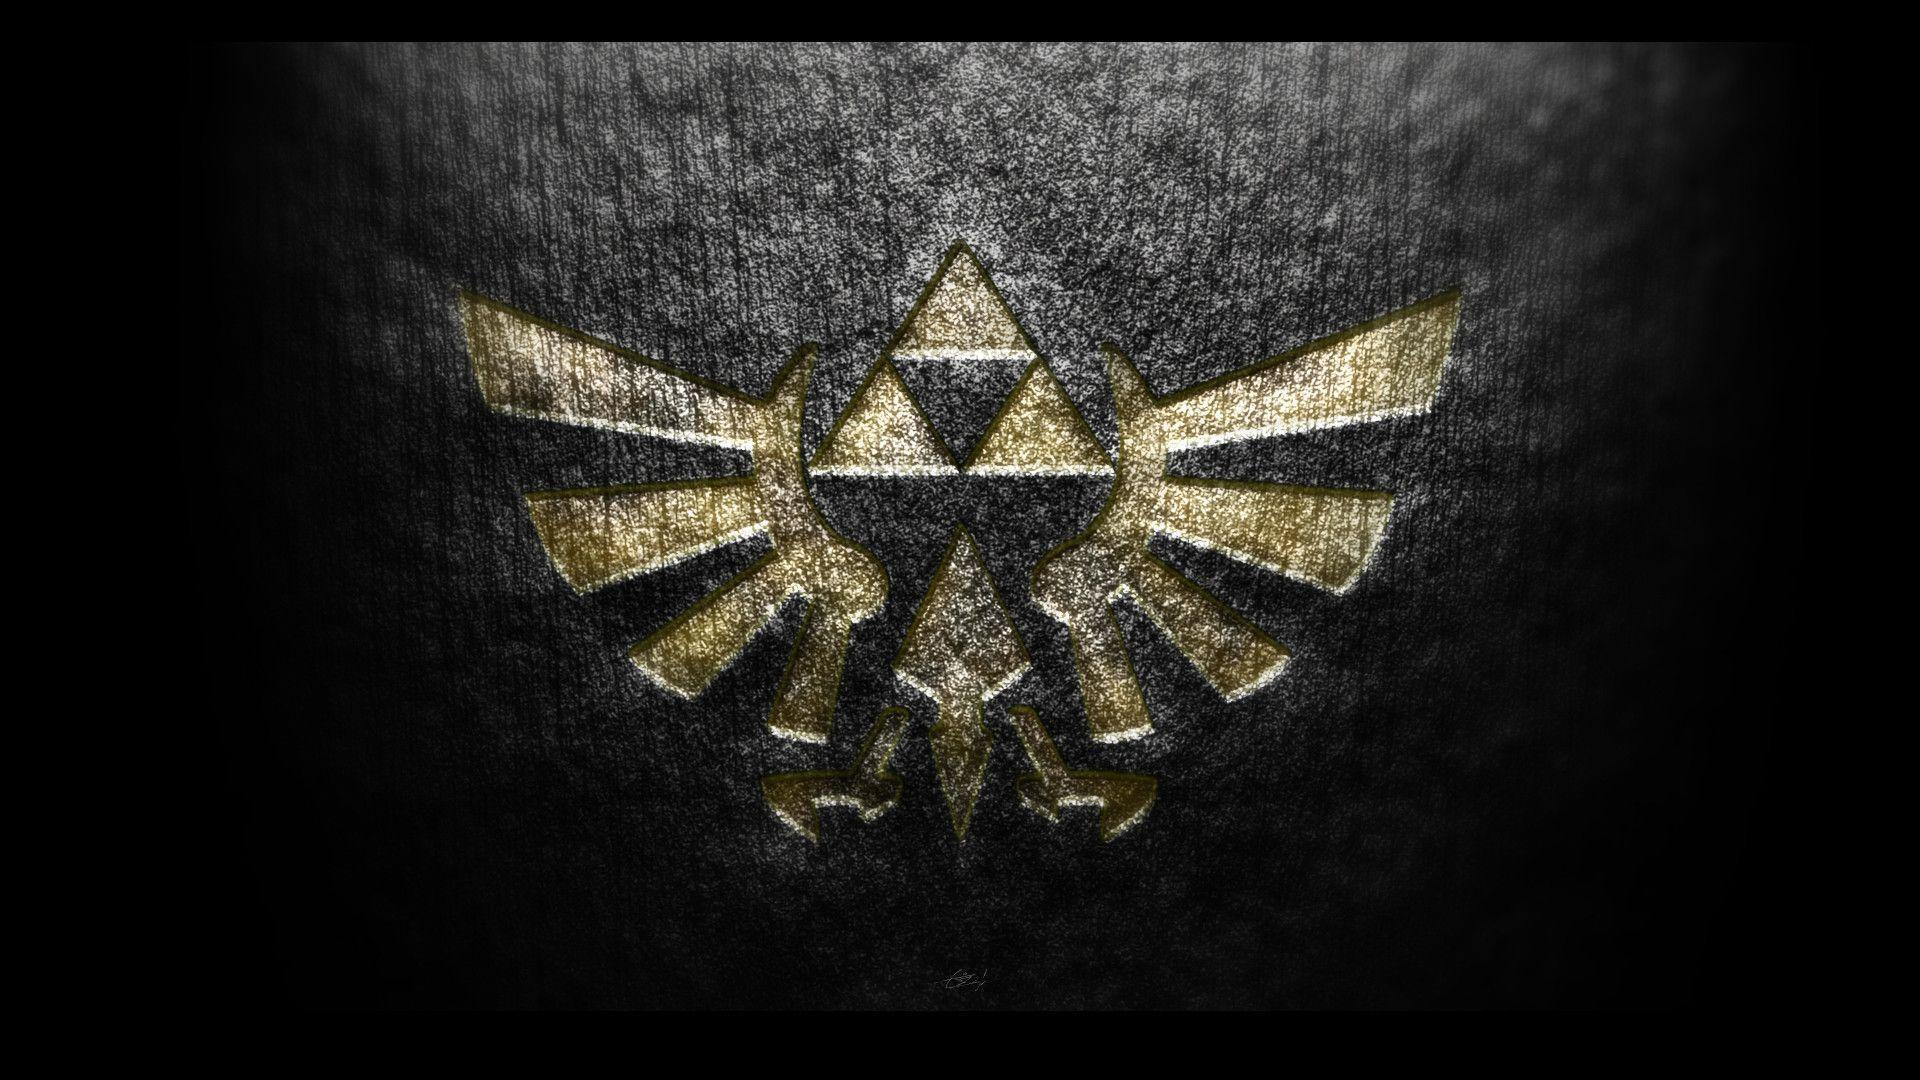 Zelda Wallpaper 1920x1080 Triforce Triforce Backgrounds -...